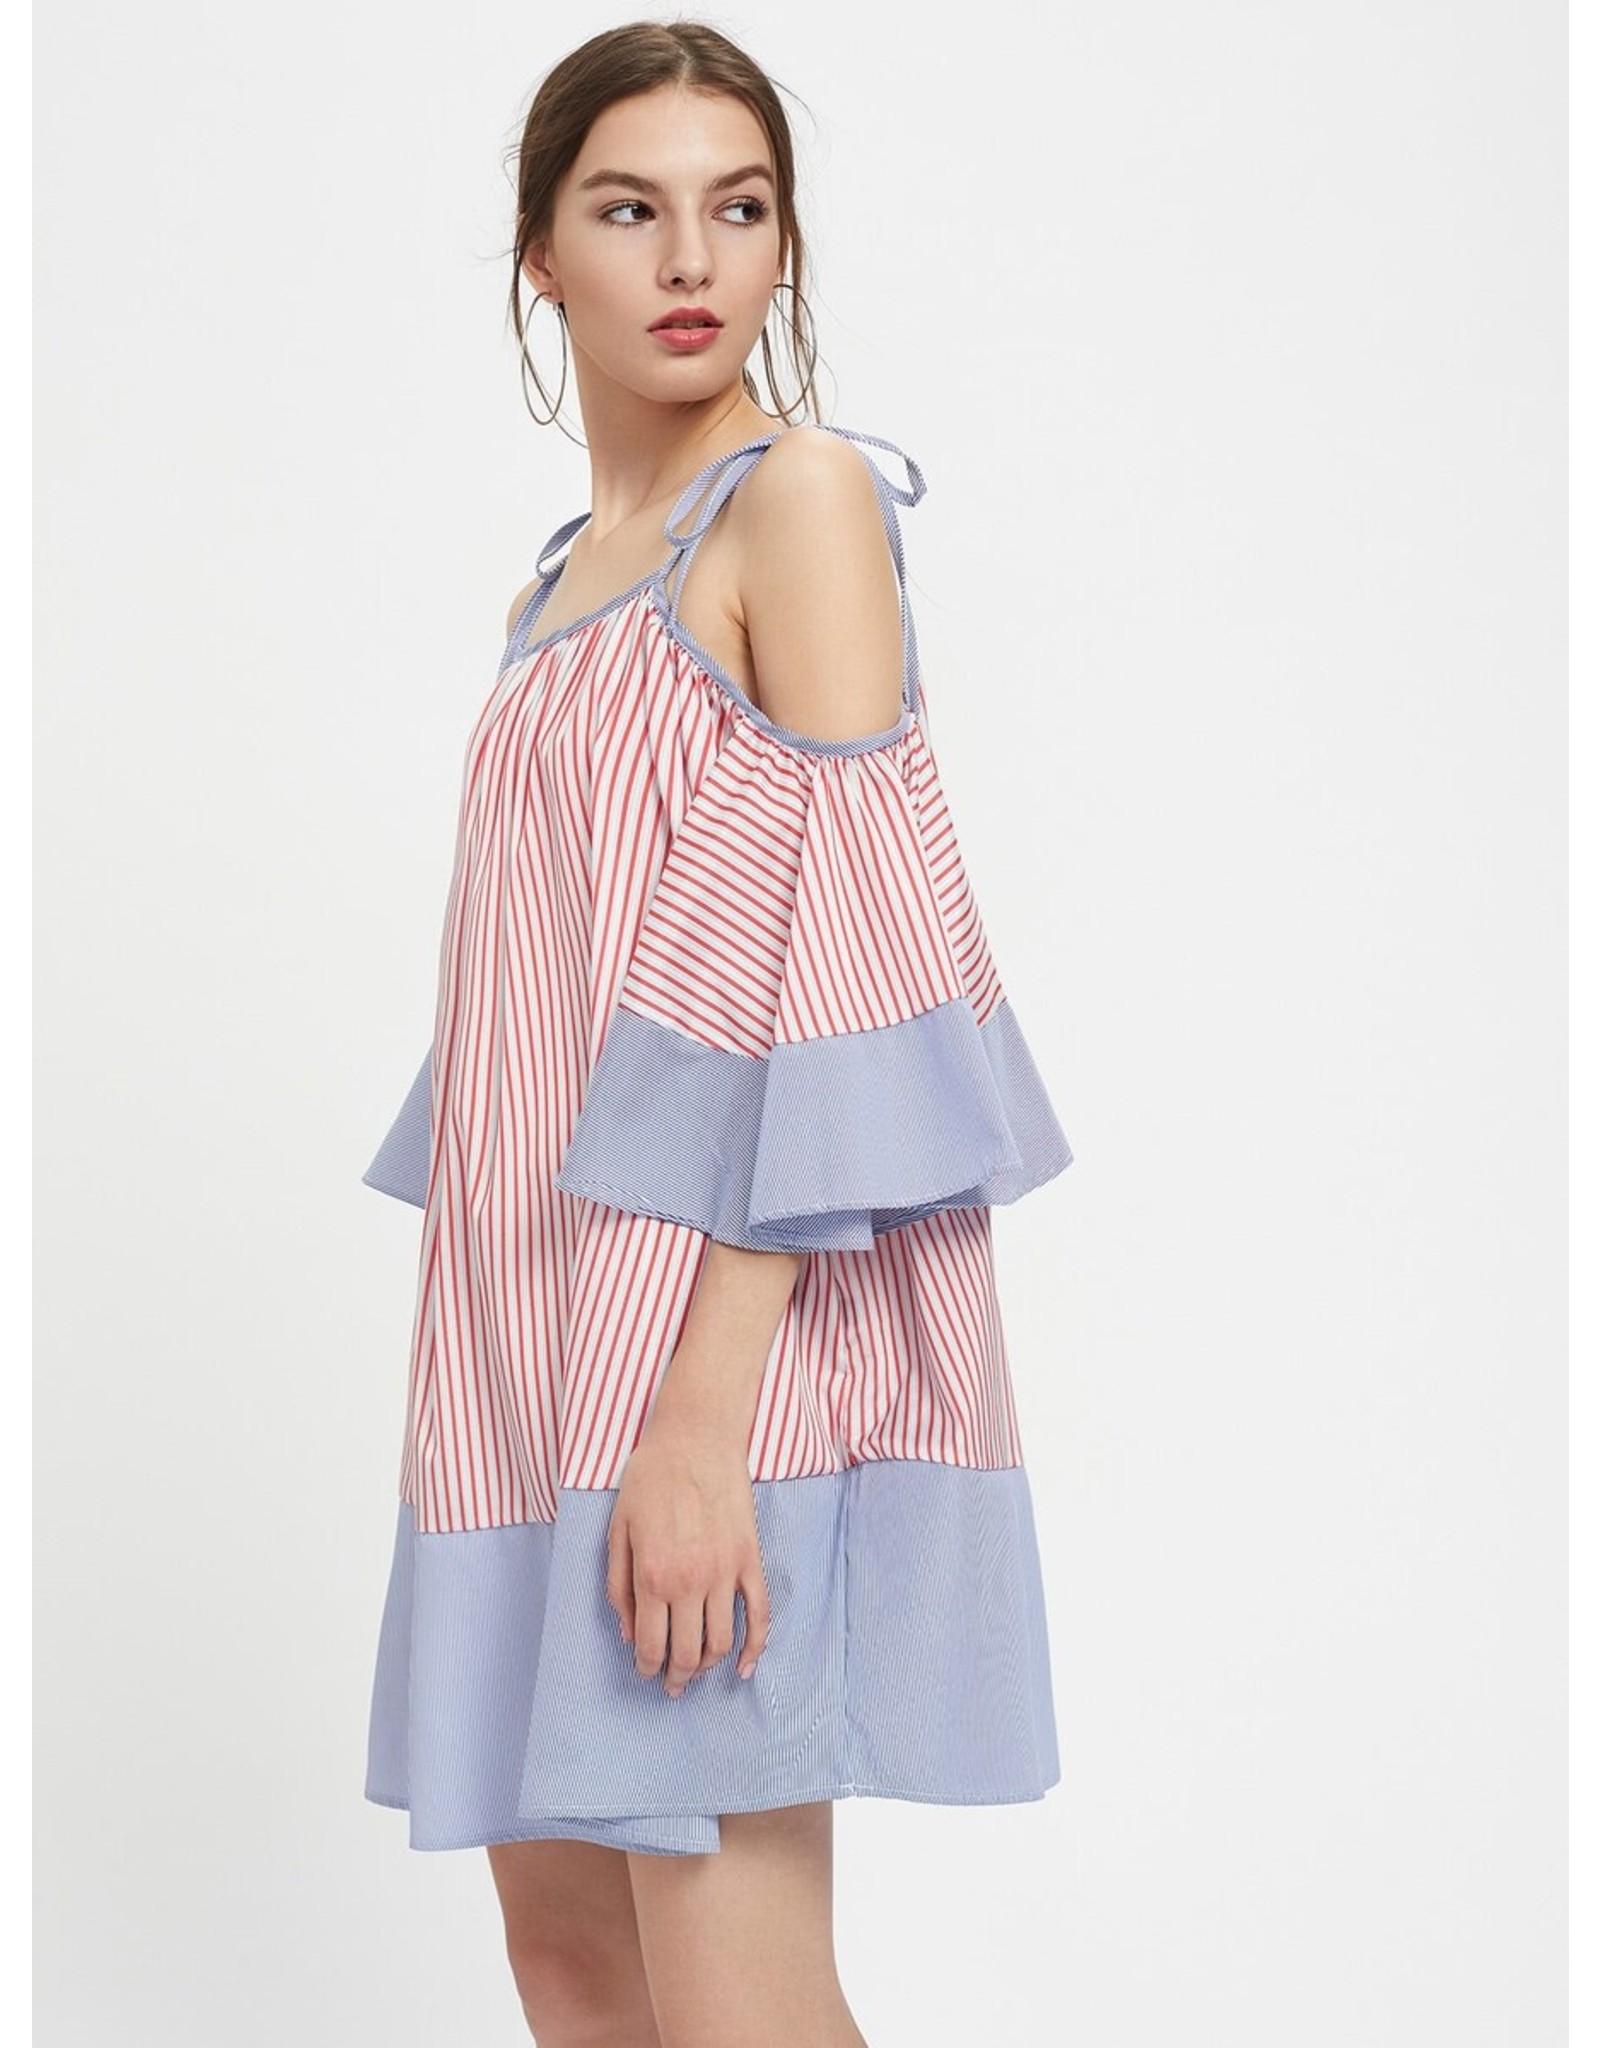 Love Shop Pray Striped shorts dress